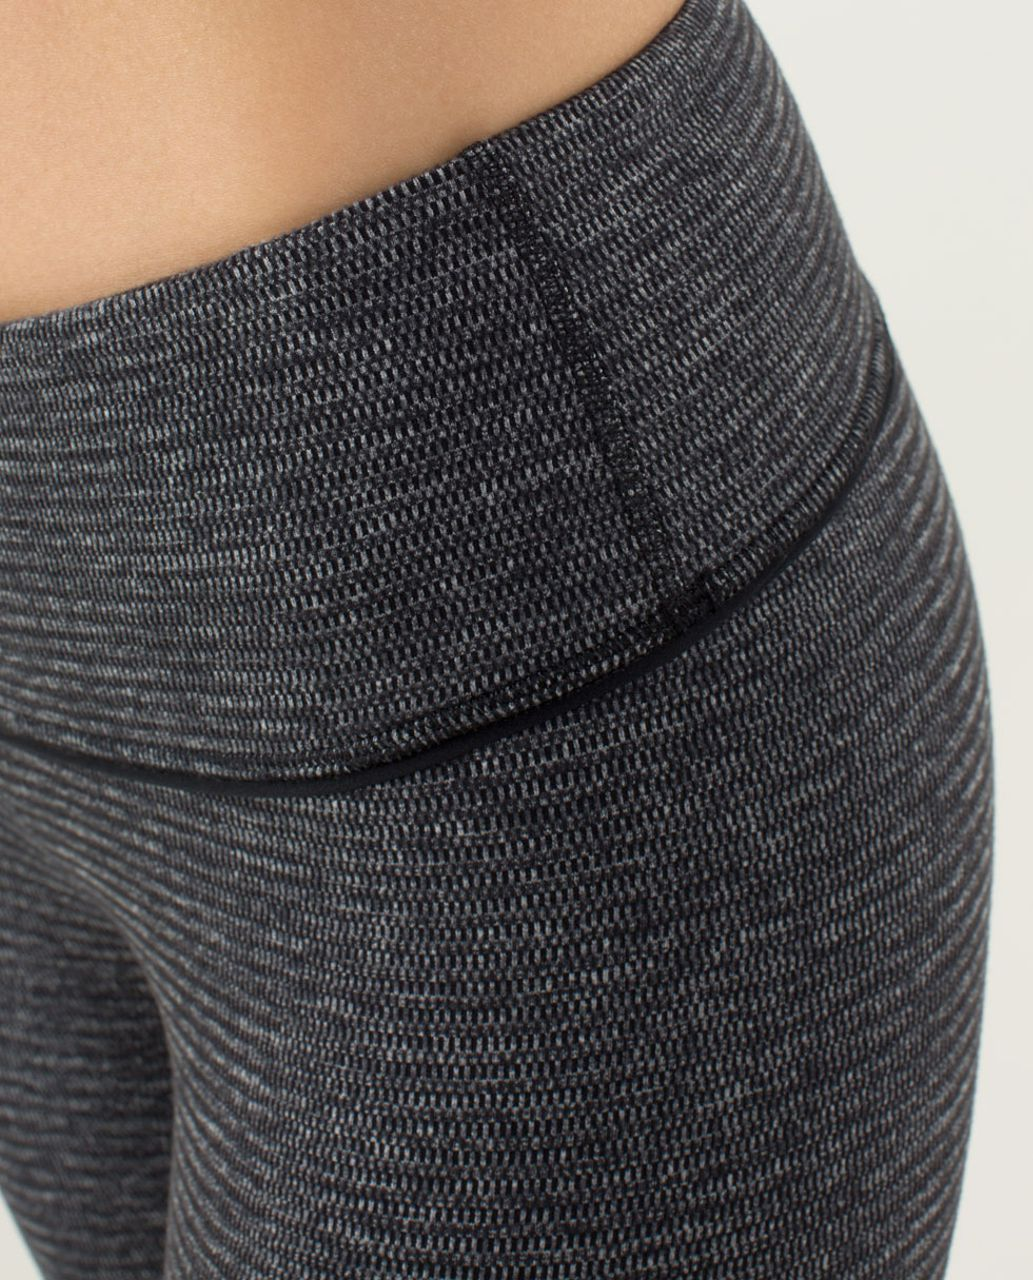 Lululemon Wunder Under Pant *Textured - Black / Deep Coal